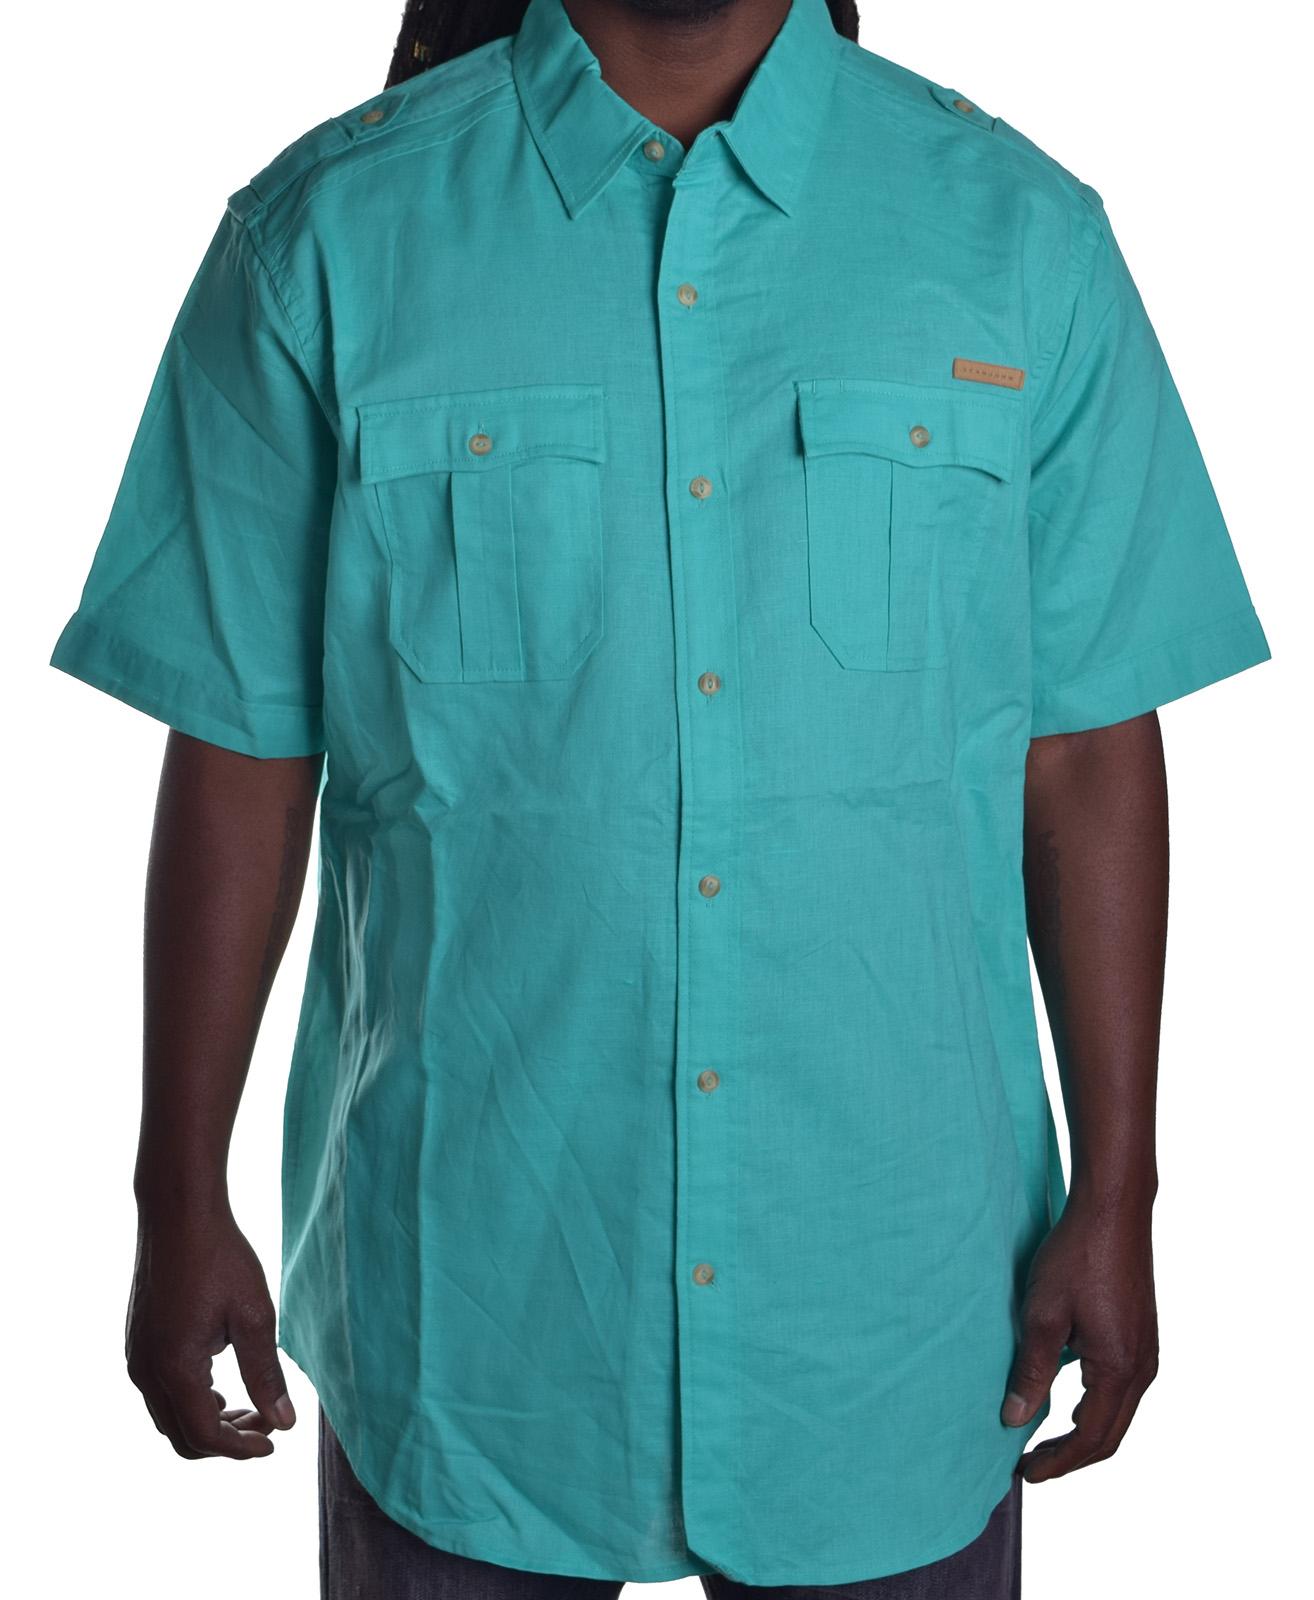 Sean john men 39 s original fit linen button up shirt ebay for Sean john t shirts for mens